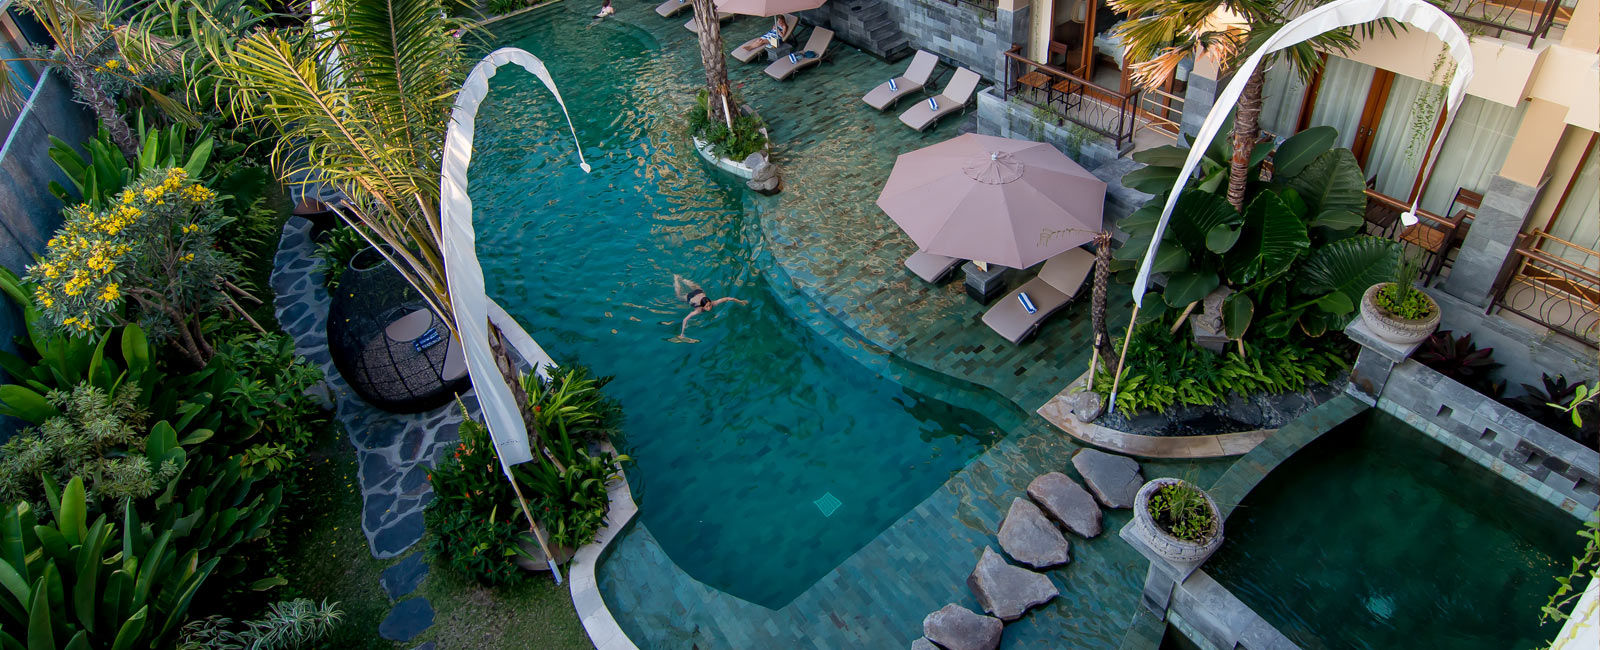 Sejur Singapore, Ubud & plaja Bali Sud 13 zile - Aprilie 2017